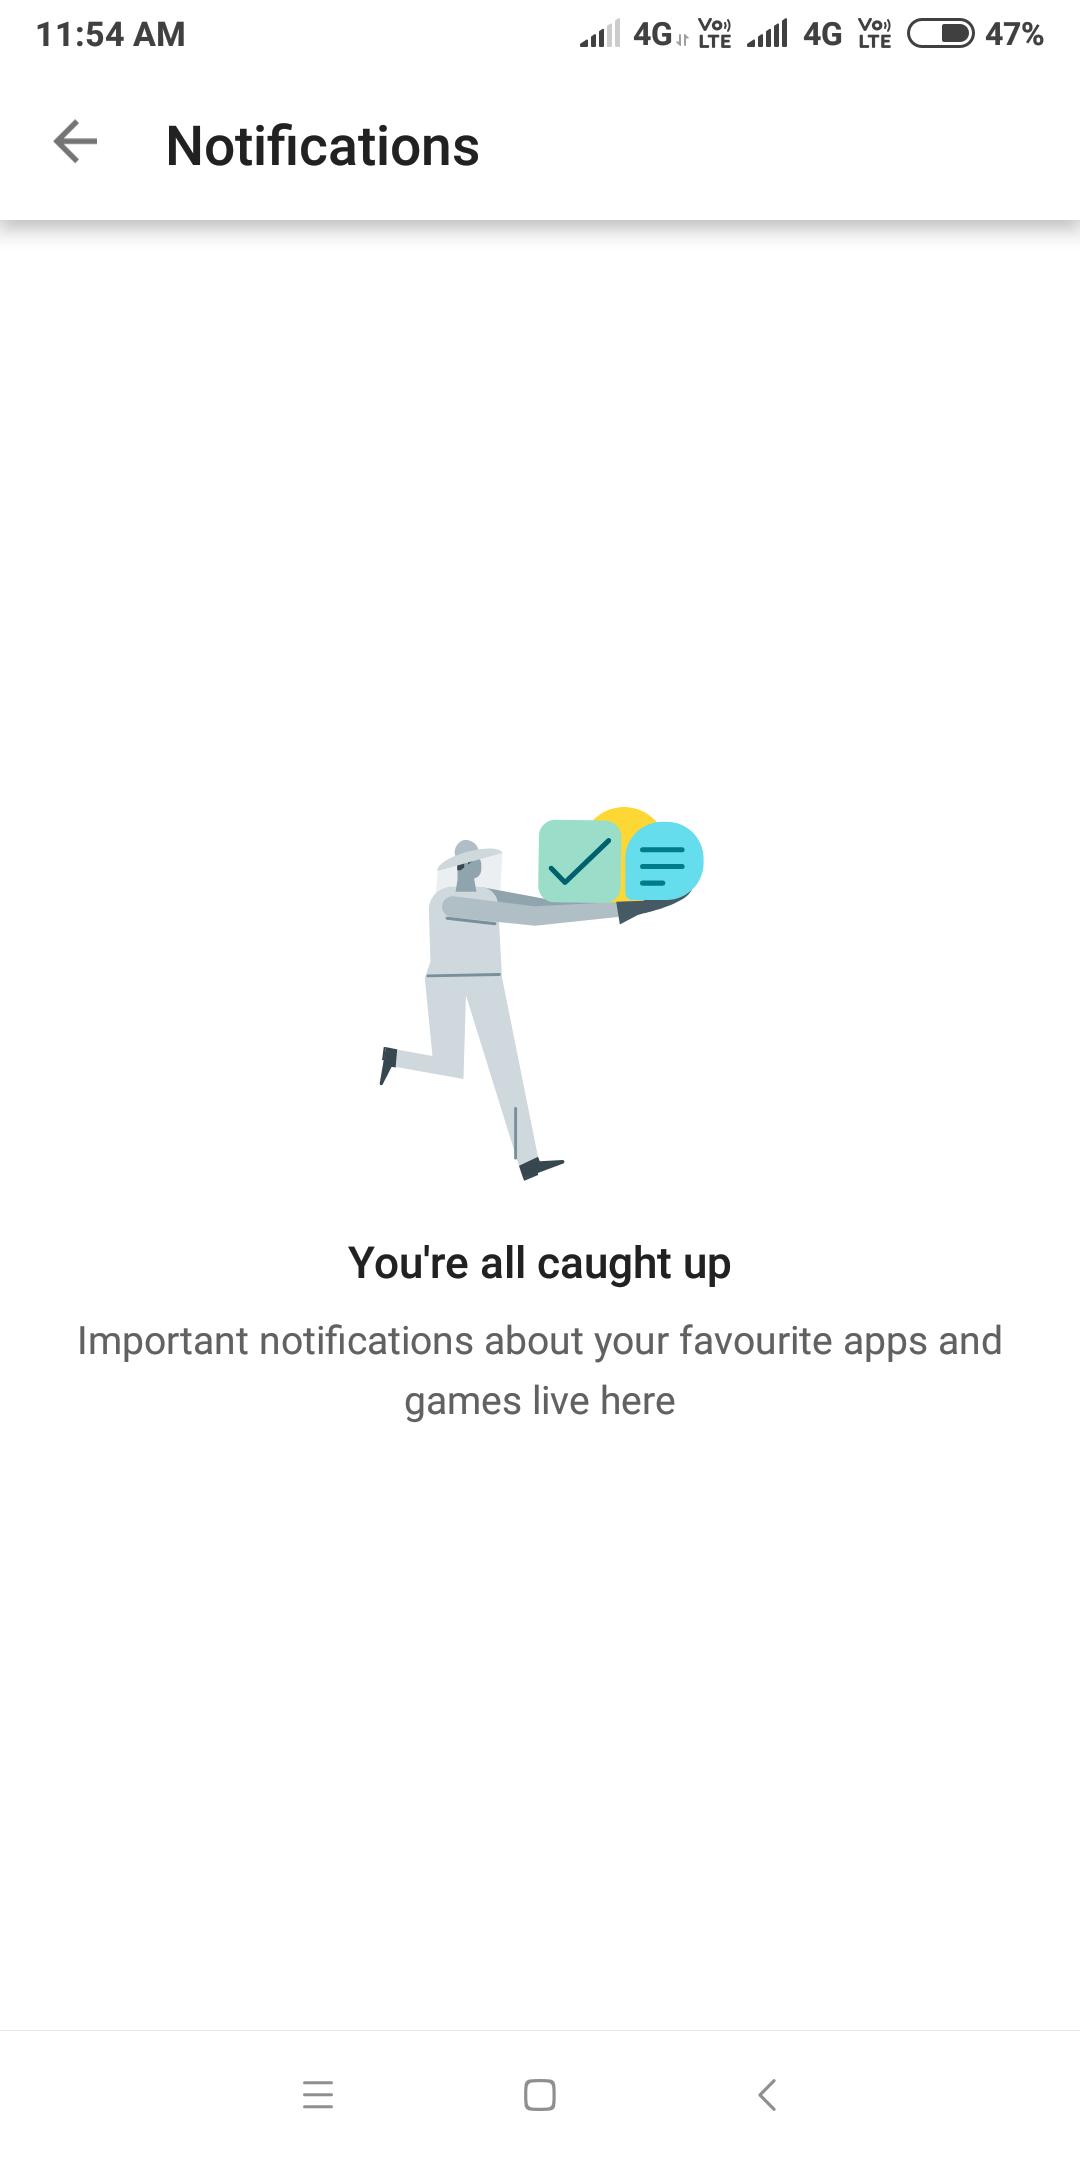 https://cdn0.desidime.com/attachments/photos/543605/original/Screenshot_2018-12-24-11-54-08-071_com.android.vending.png?1545632711